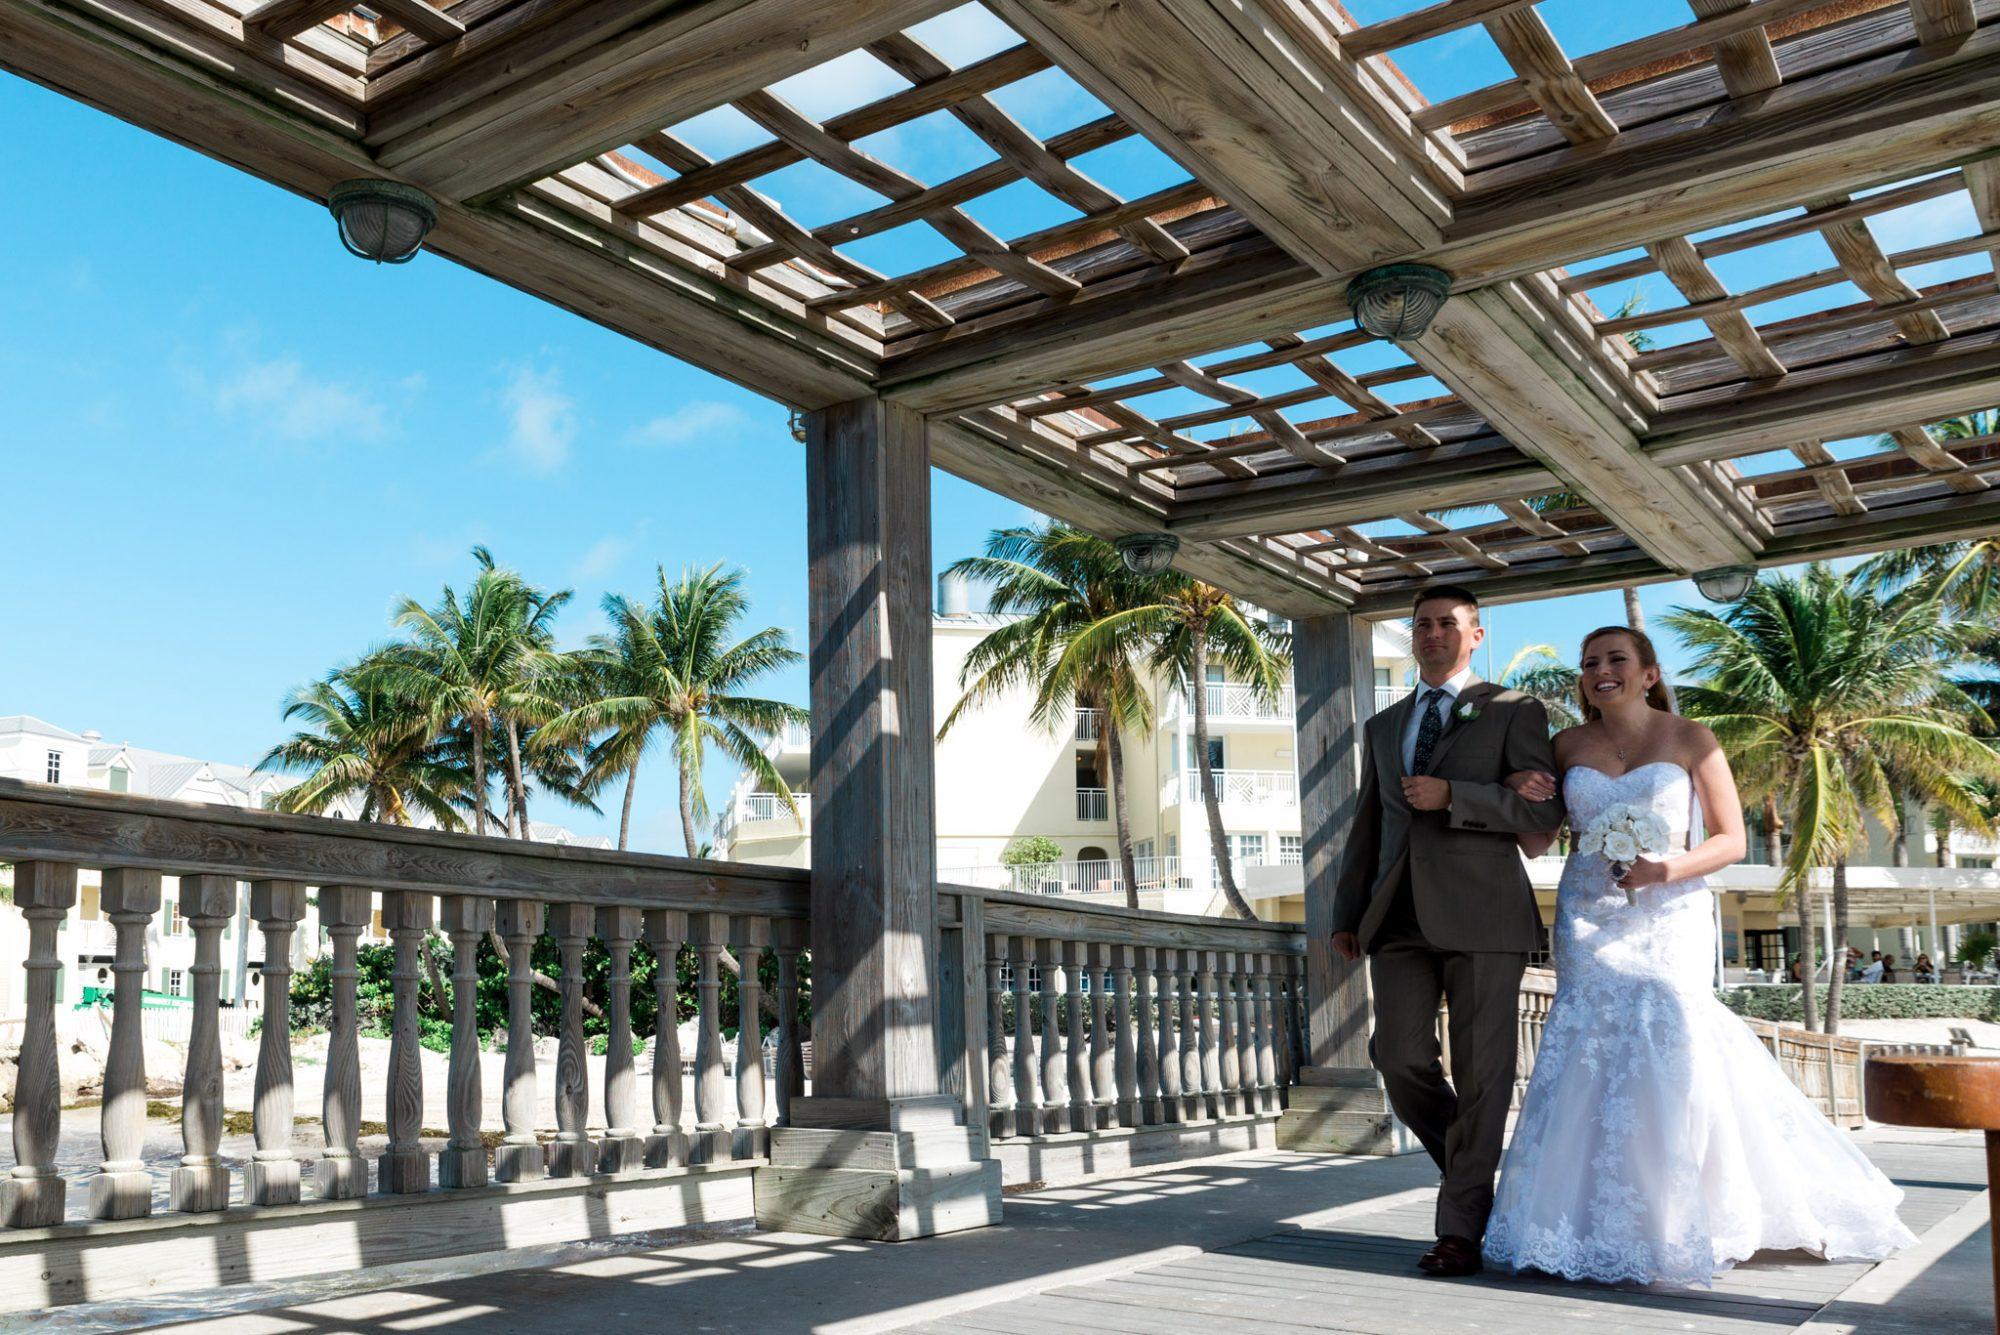 Stacey Jason Key West Wedding Photographer Reach Resort 16 - Stacy & Jason - Key West Wedding Photographer - Reach Resort